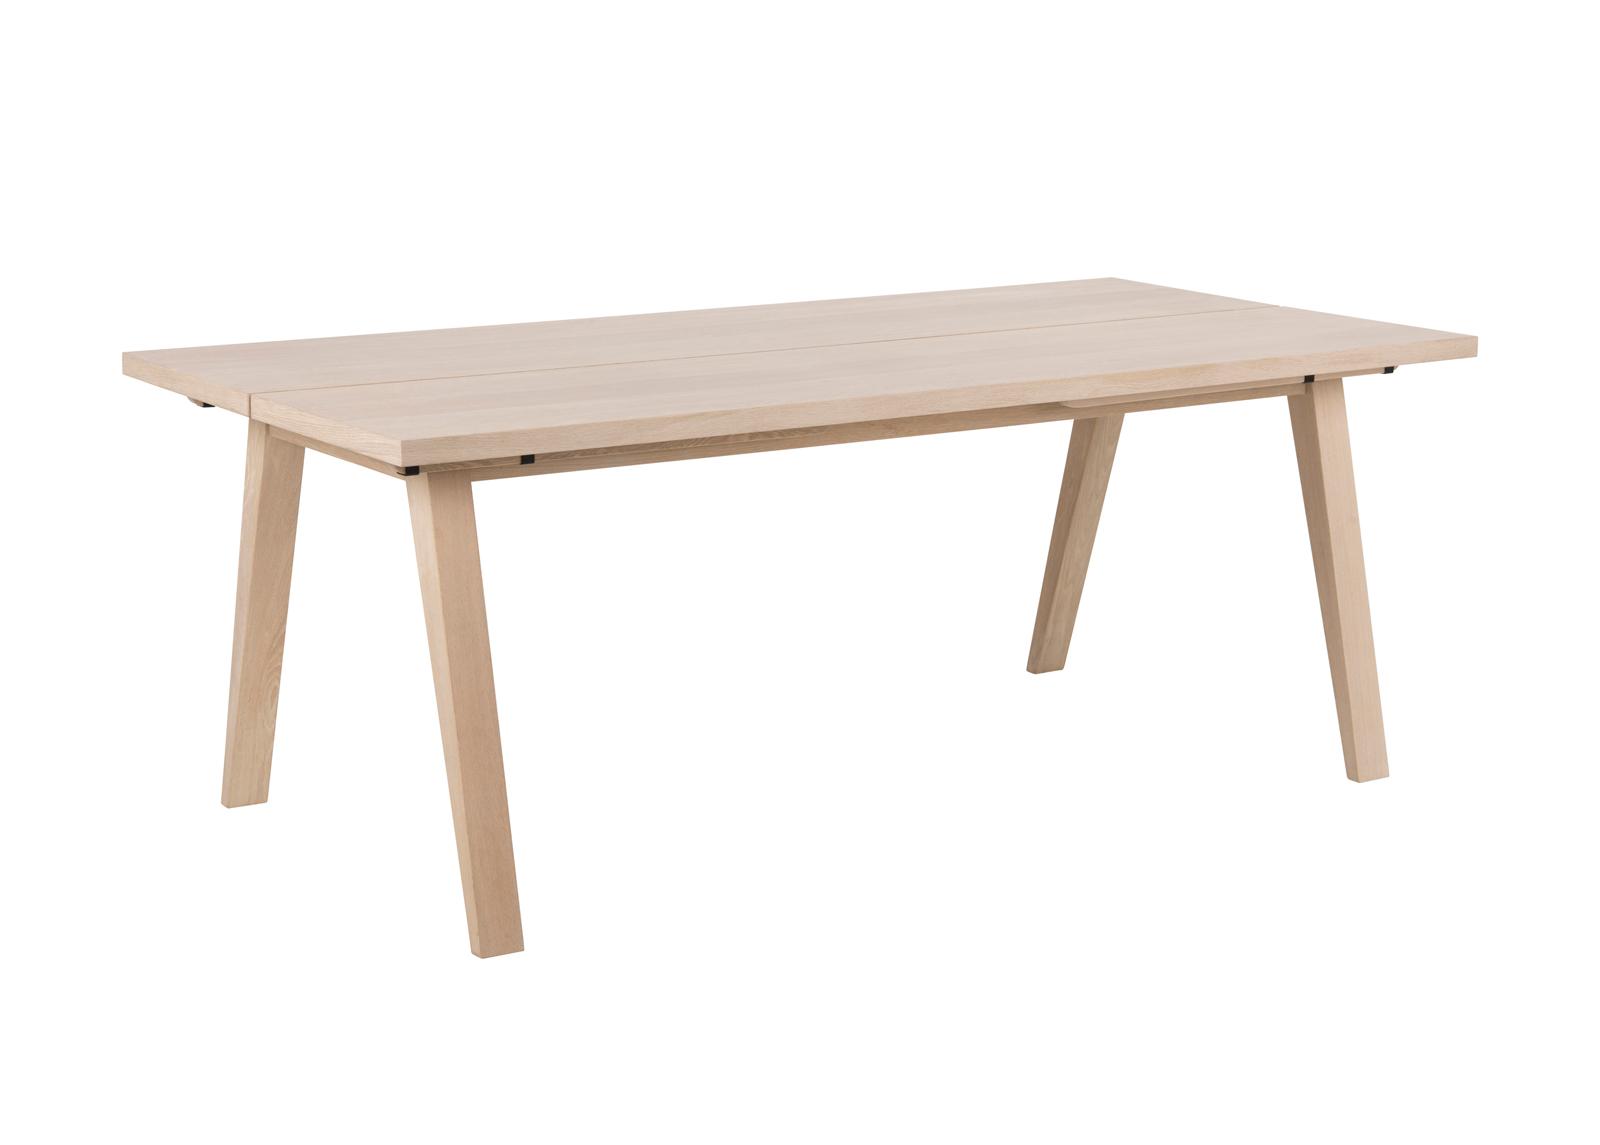 Ruokapöytä A-line 95x200 cm